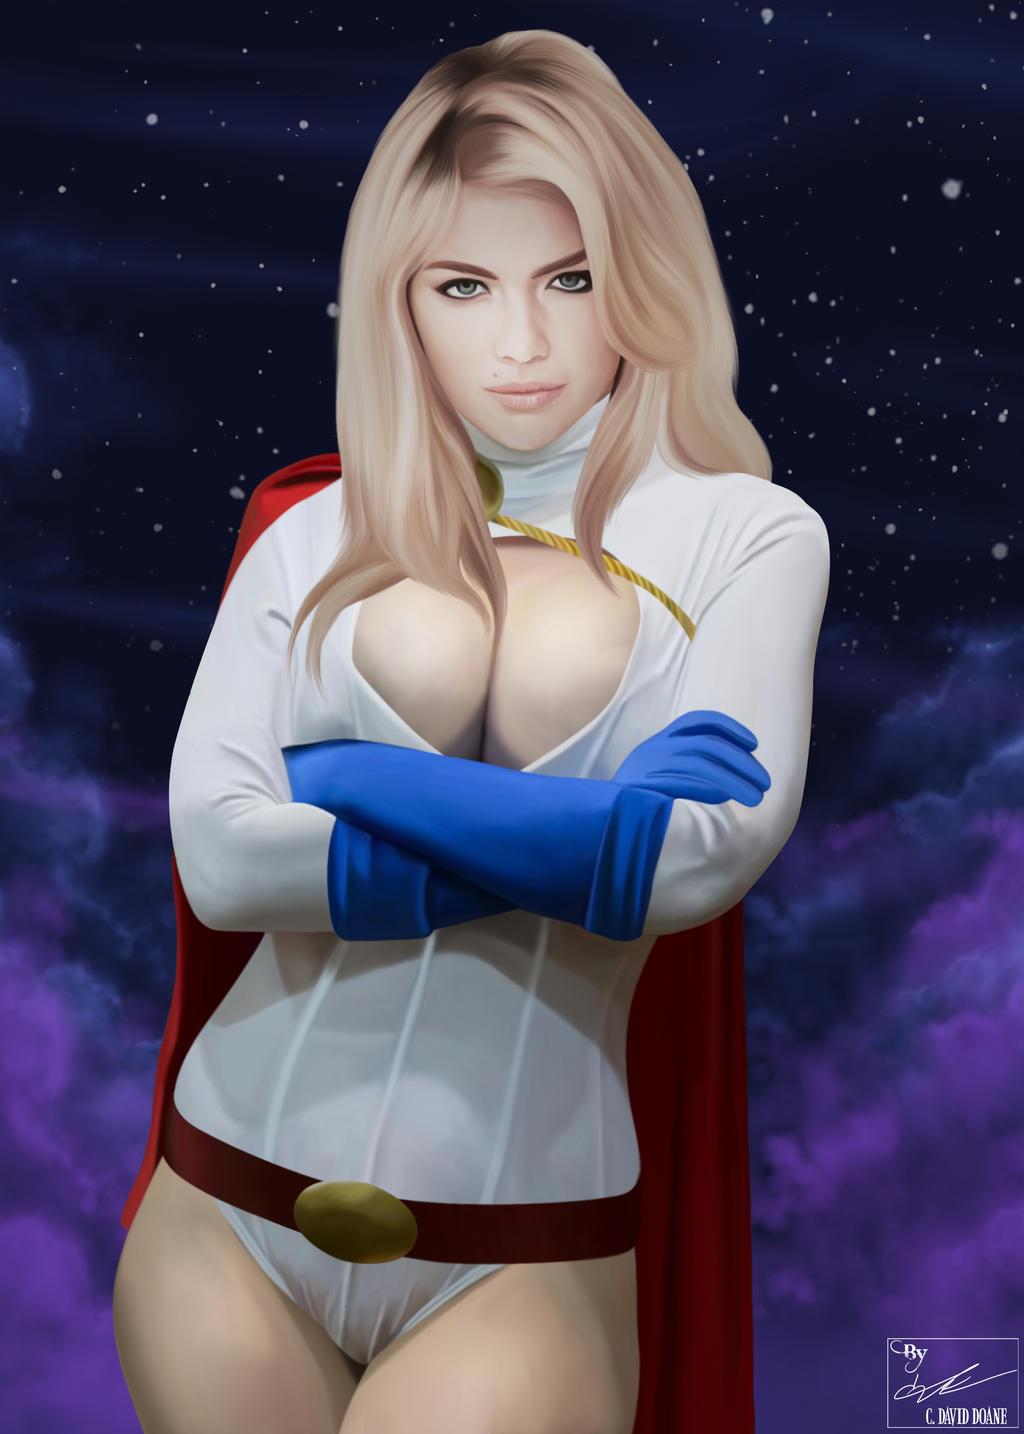 Kate Upton as Powergirl by frostdusk